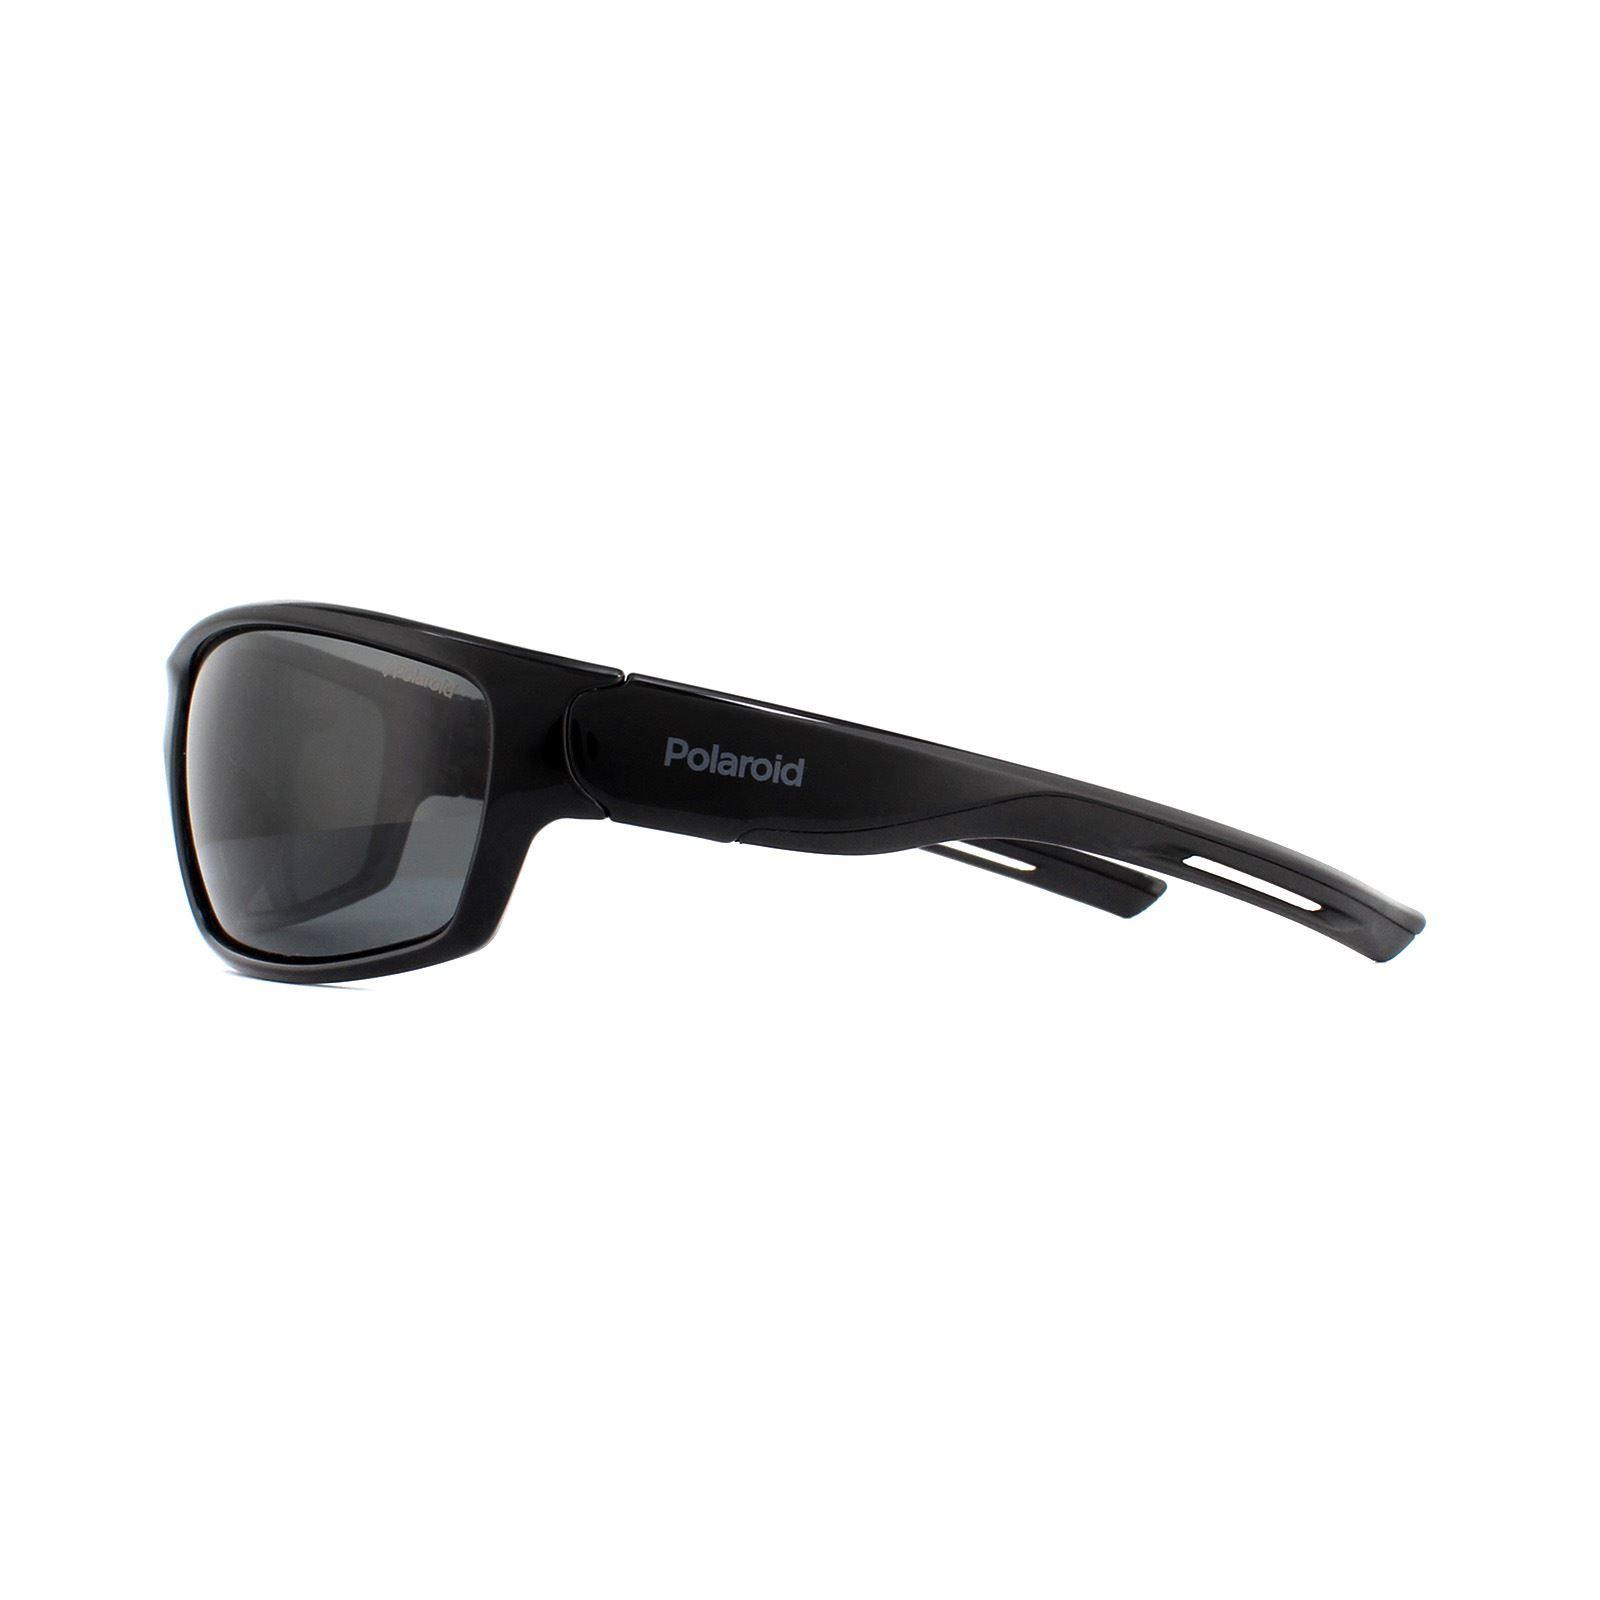 Polaroid Sport Sunglasses 7029/S 807 M9 Black Grey Polarized